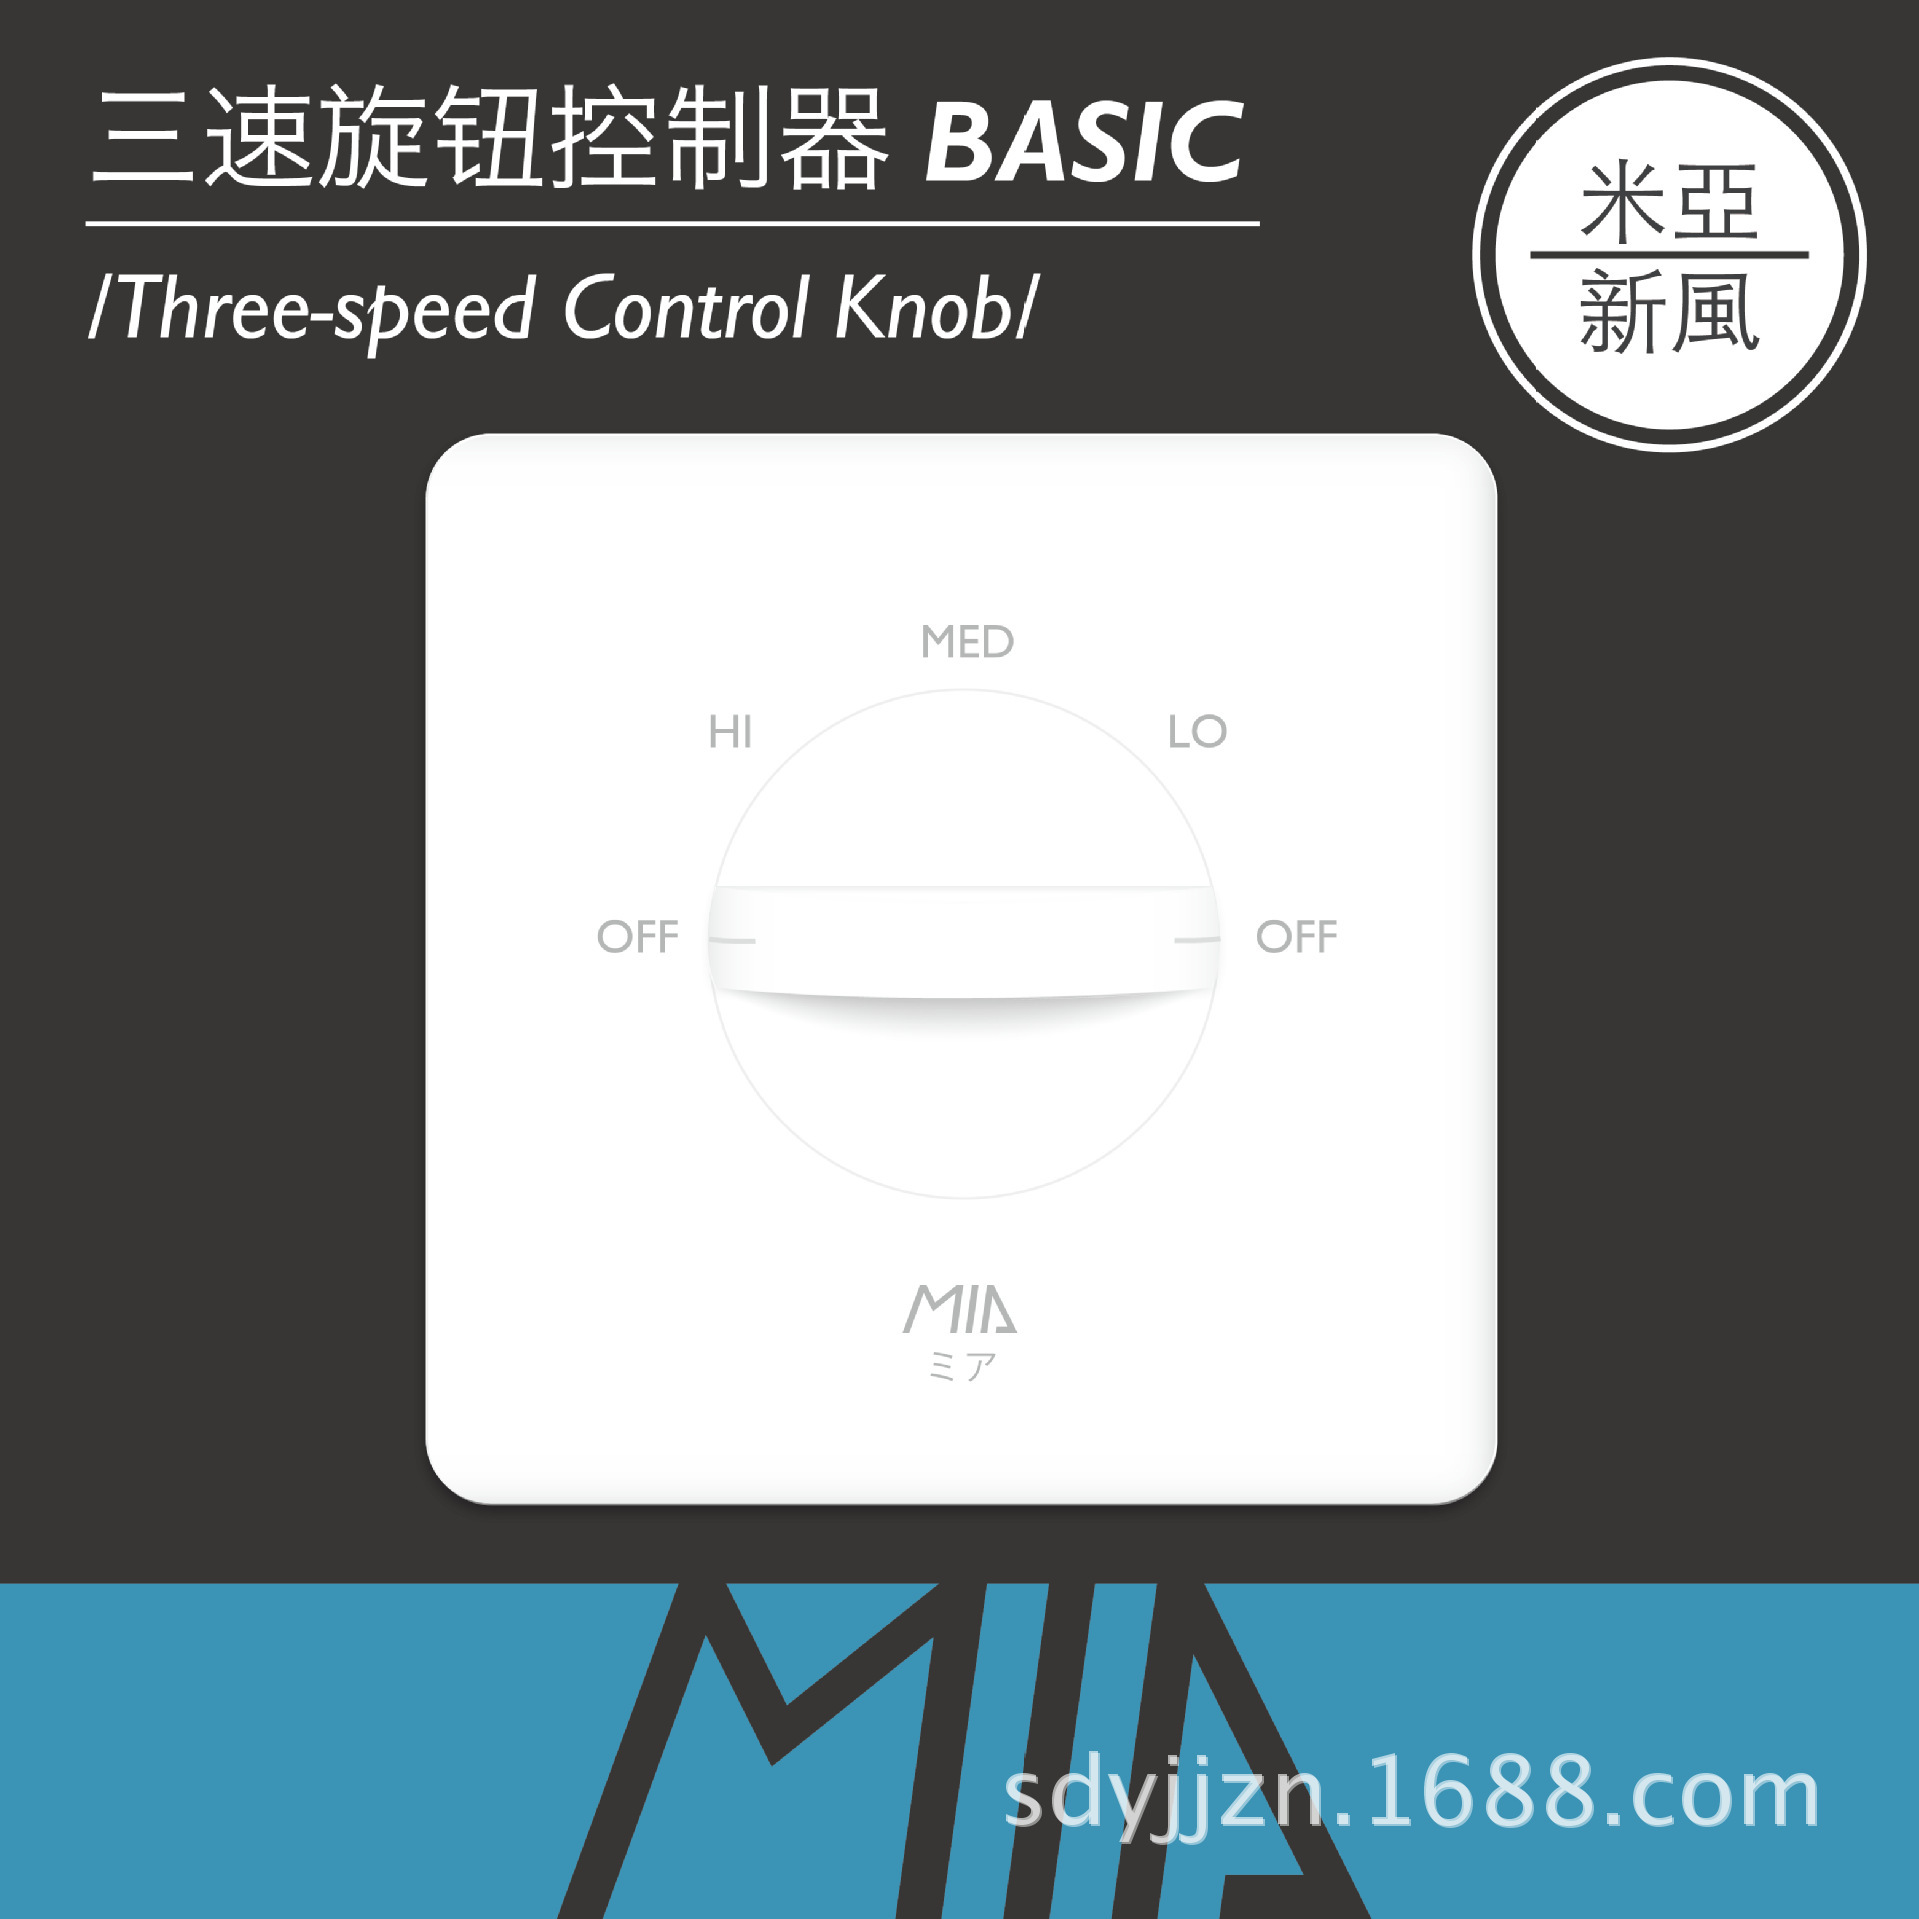 米亚 пористой самобалансирующейся негативное давление свежего воздуха машина 450 MIA-450W однонаправленный поток воздуха центральной свежий воздух